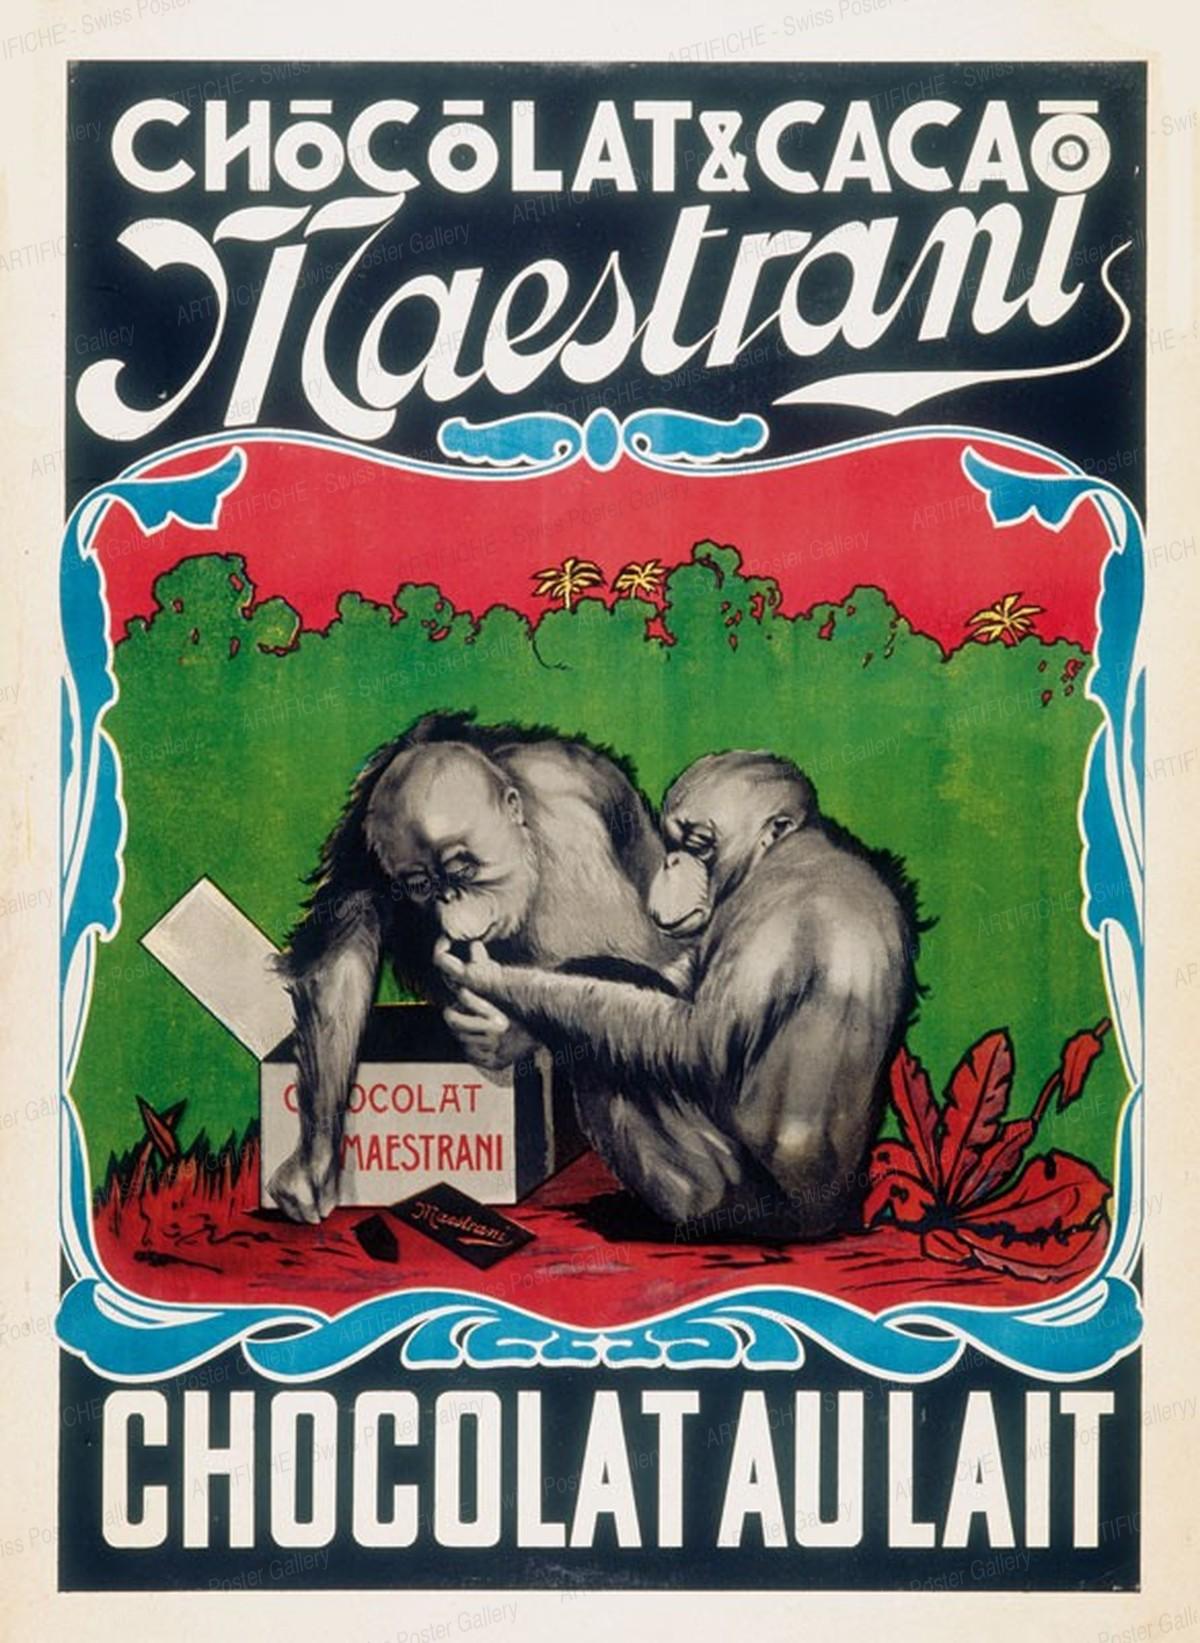 Maestrani – Chocolat & Cacao, Artist unknown